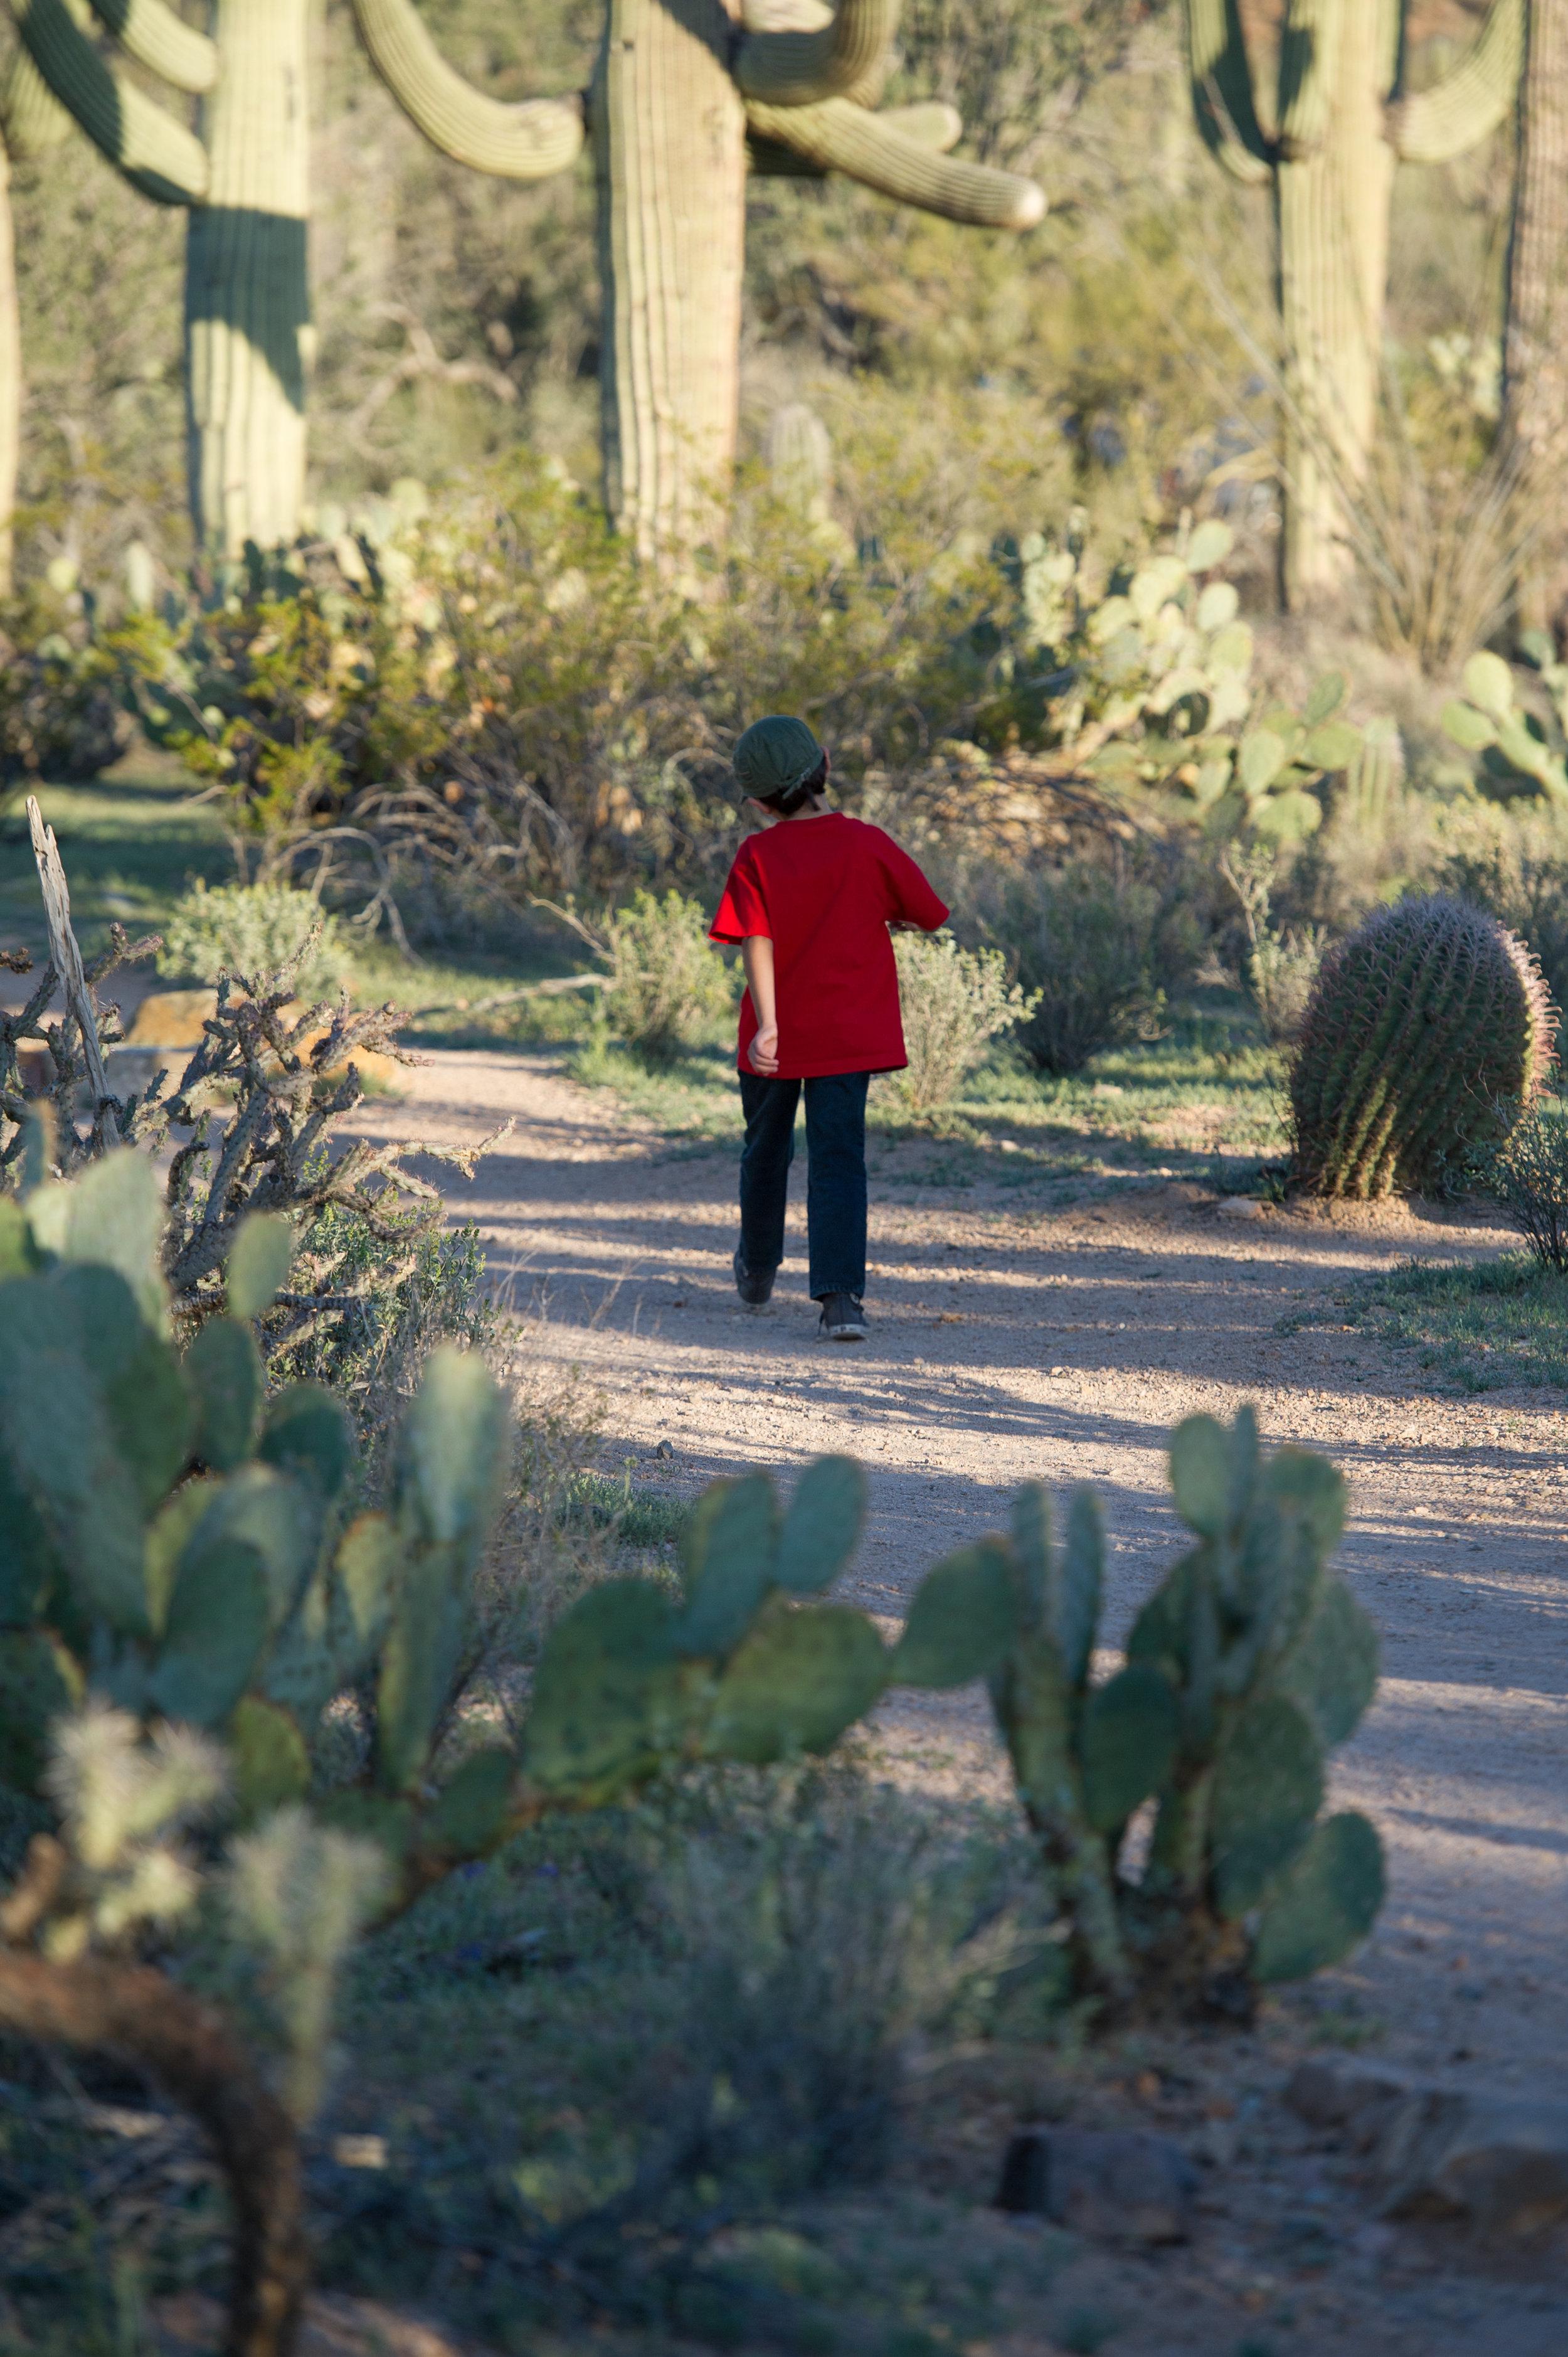 Anthony walking in the desert